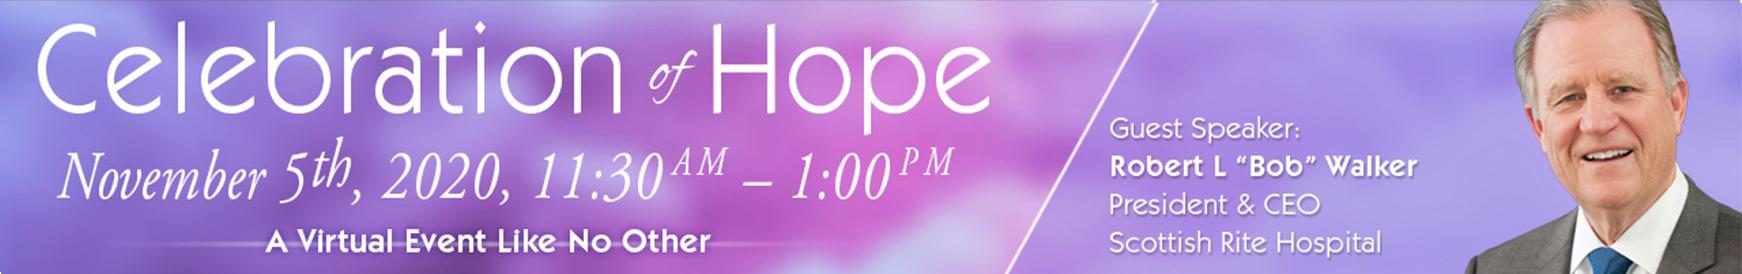 Celebration of Hope Virtual Event 2020